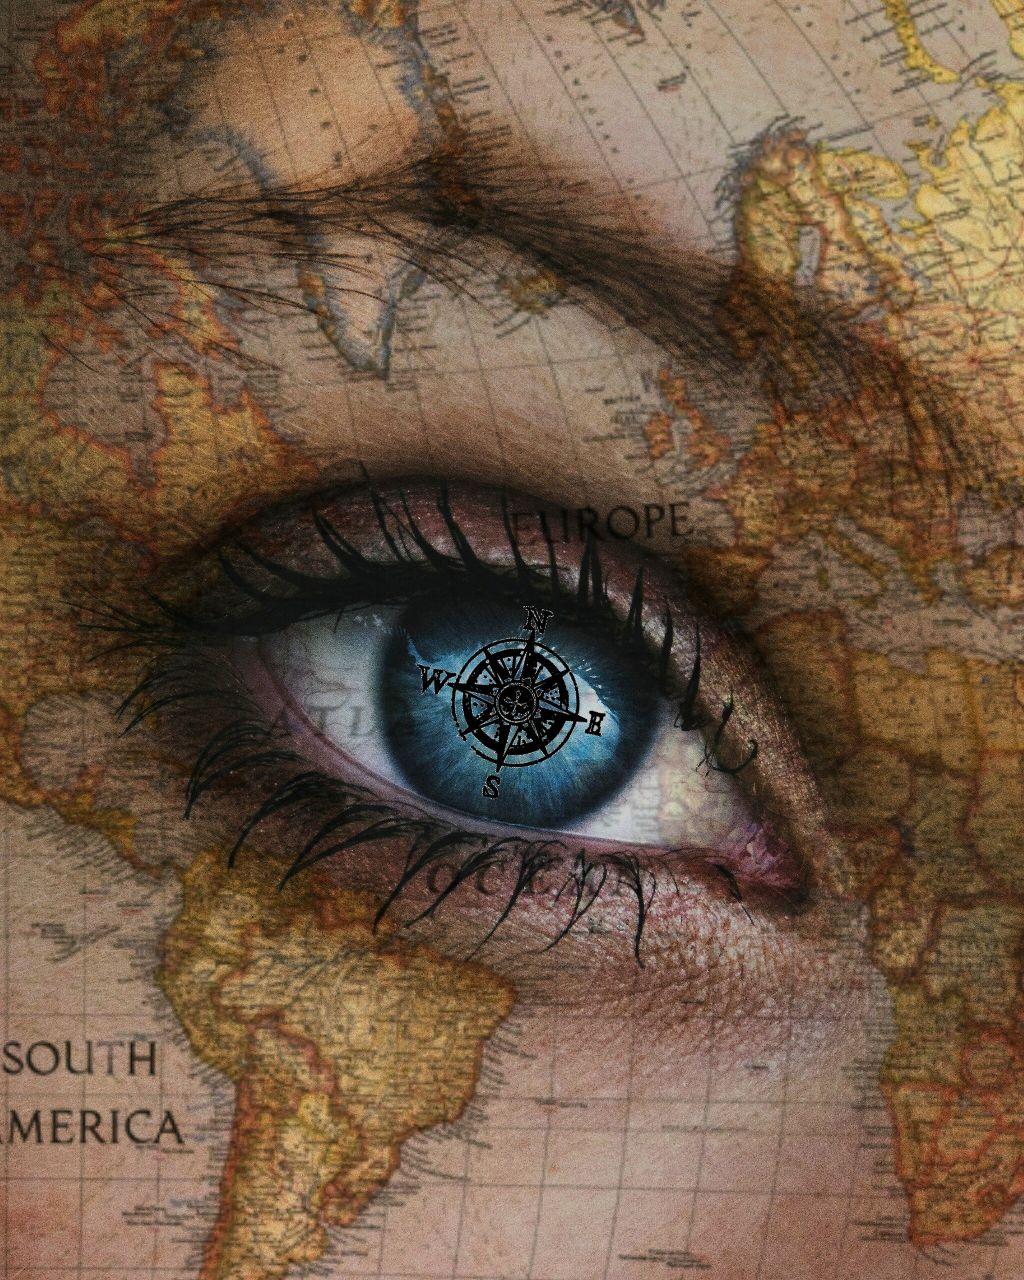 ectraveltheworld world map eye travel comp... on eye earth, eye mind map, eye egypt, eye clock, home depot map, an old map,